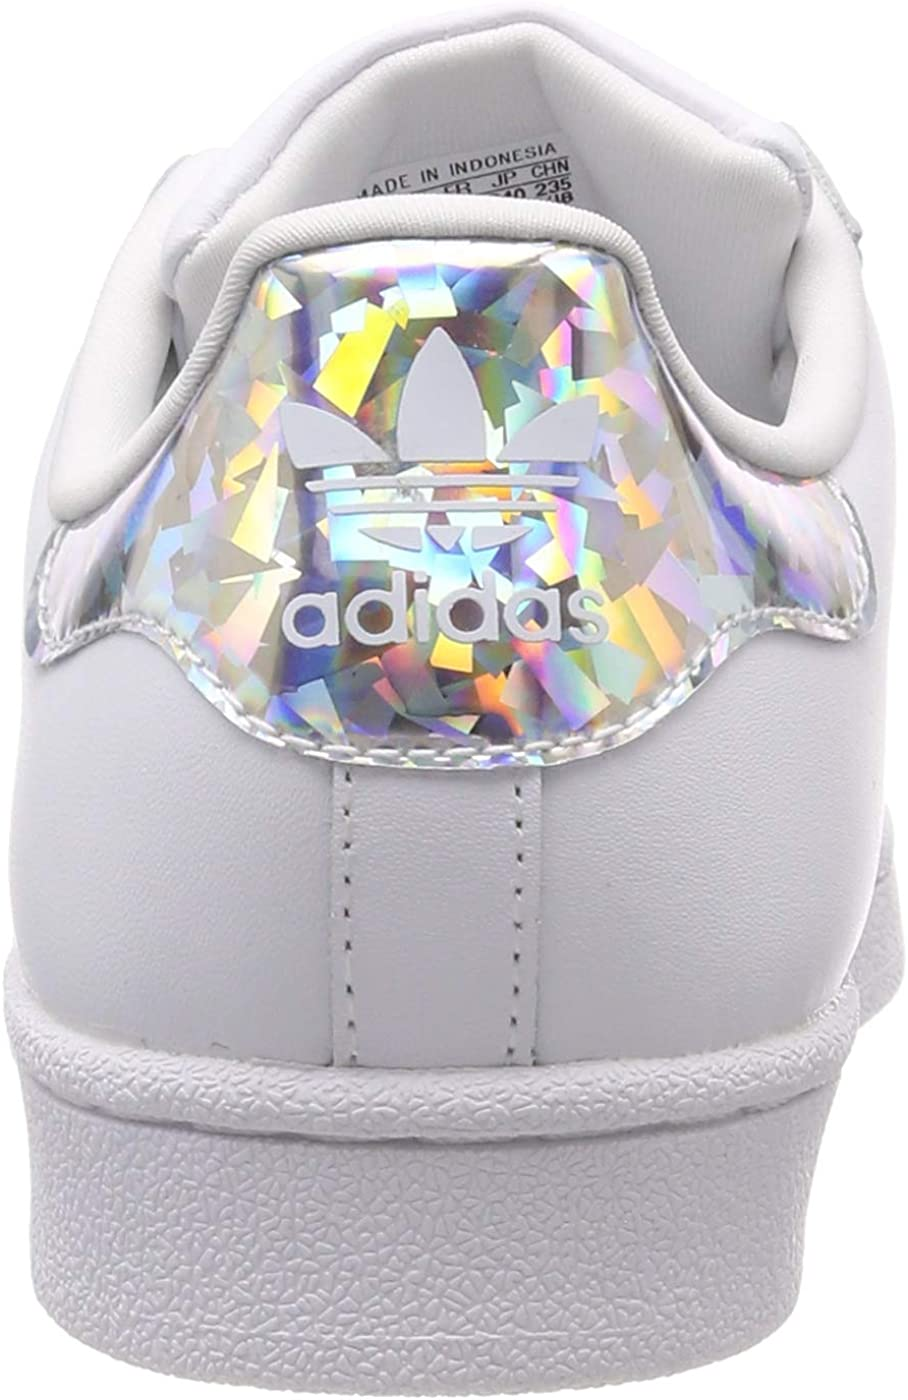 adidas superstar j chaussures de sport mixte enfant